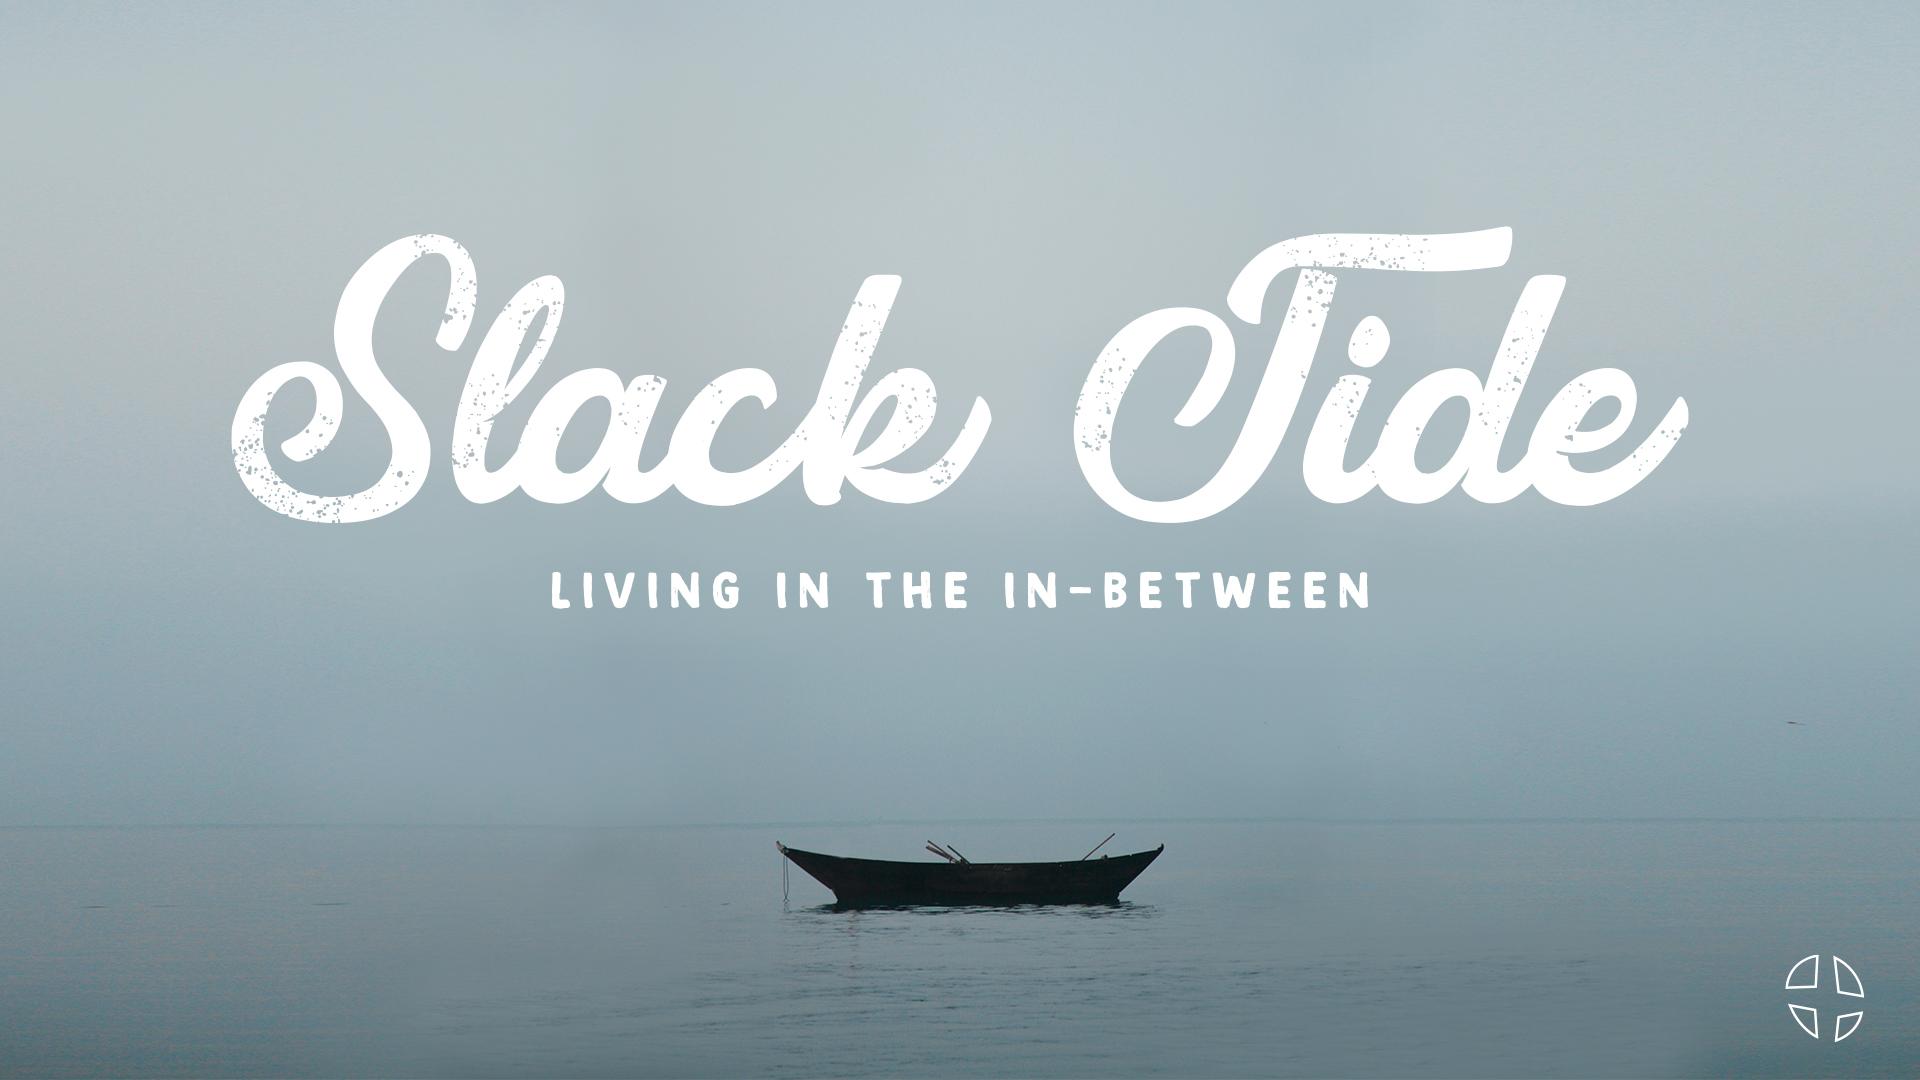 slack-tide-screen-background.jpg